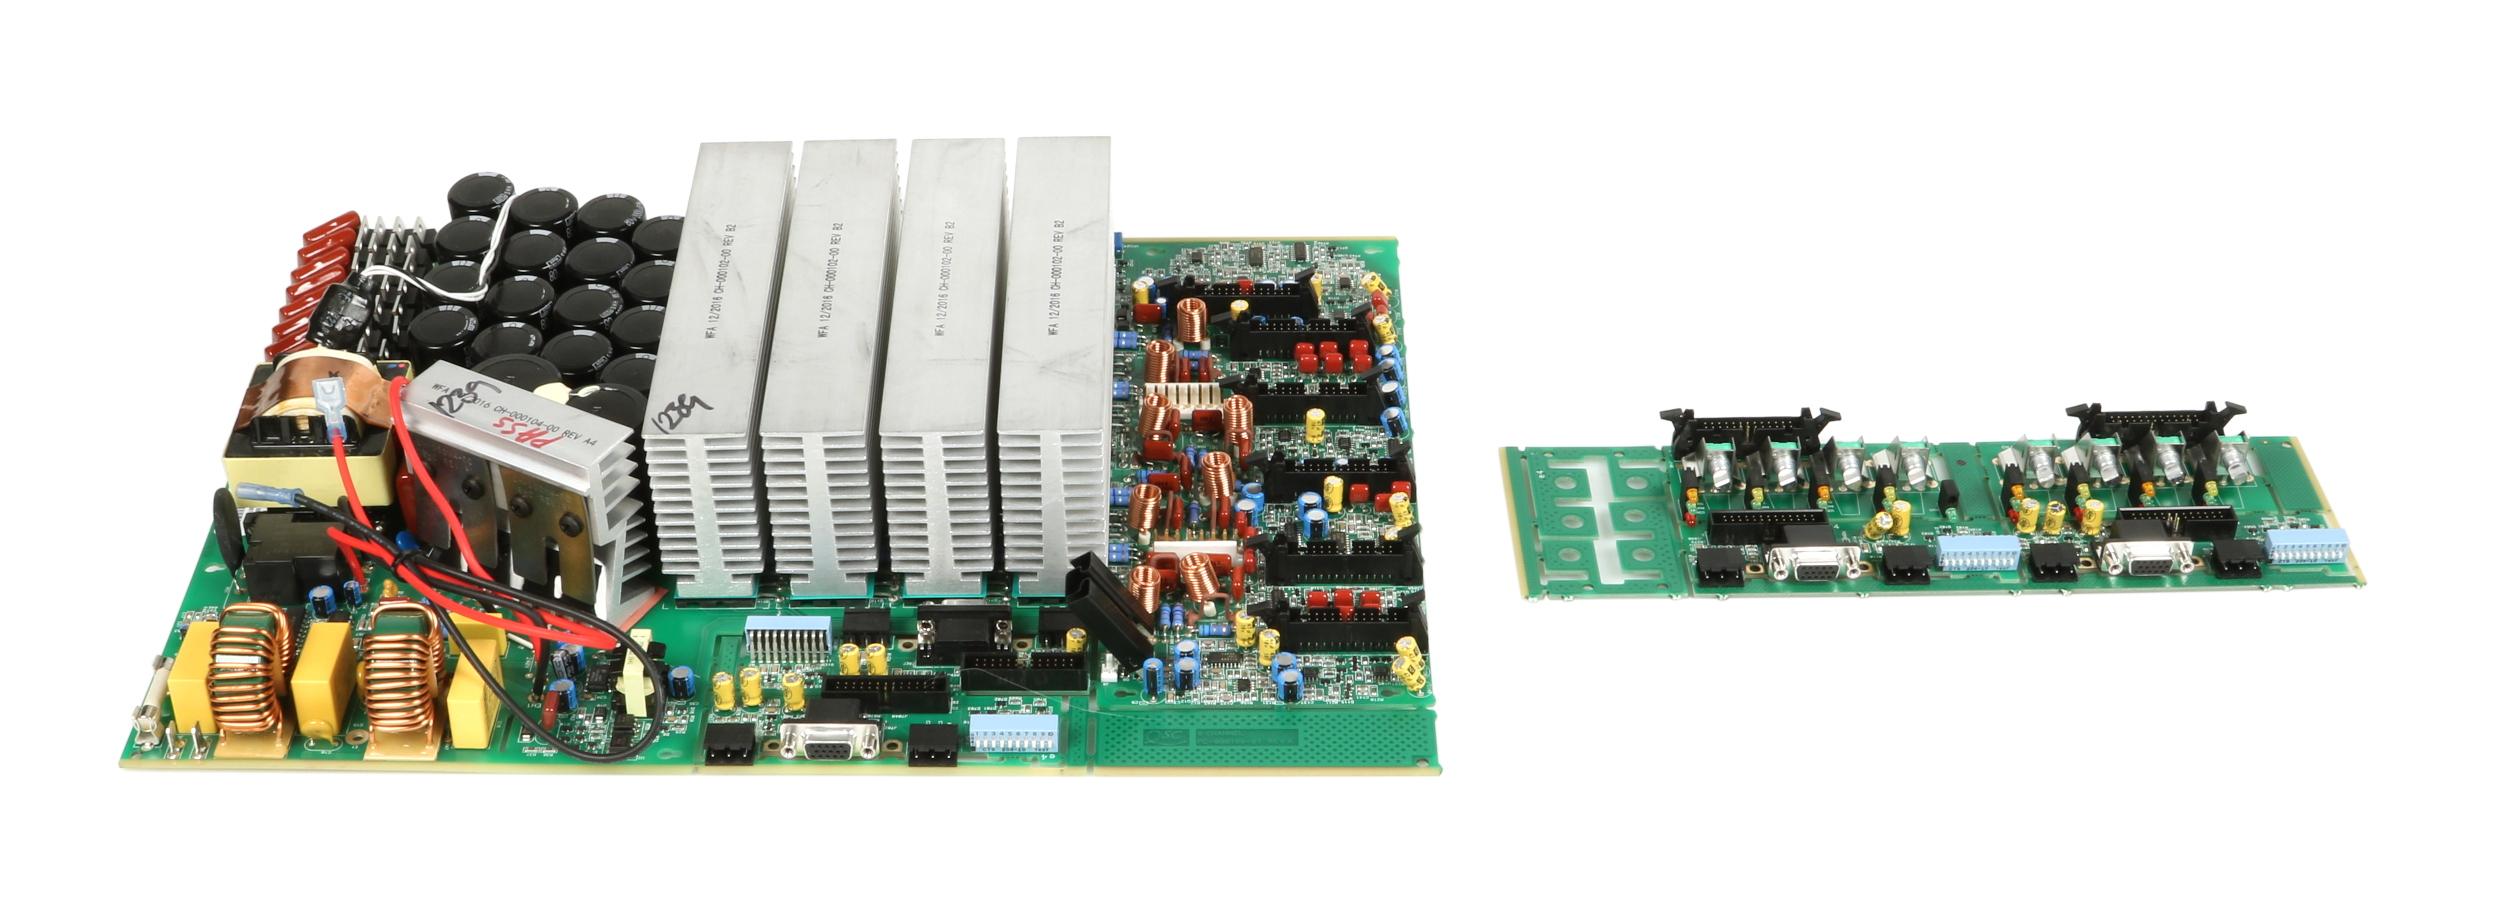 CX168 Main PCB